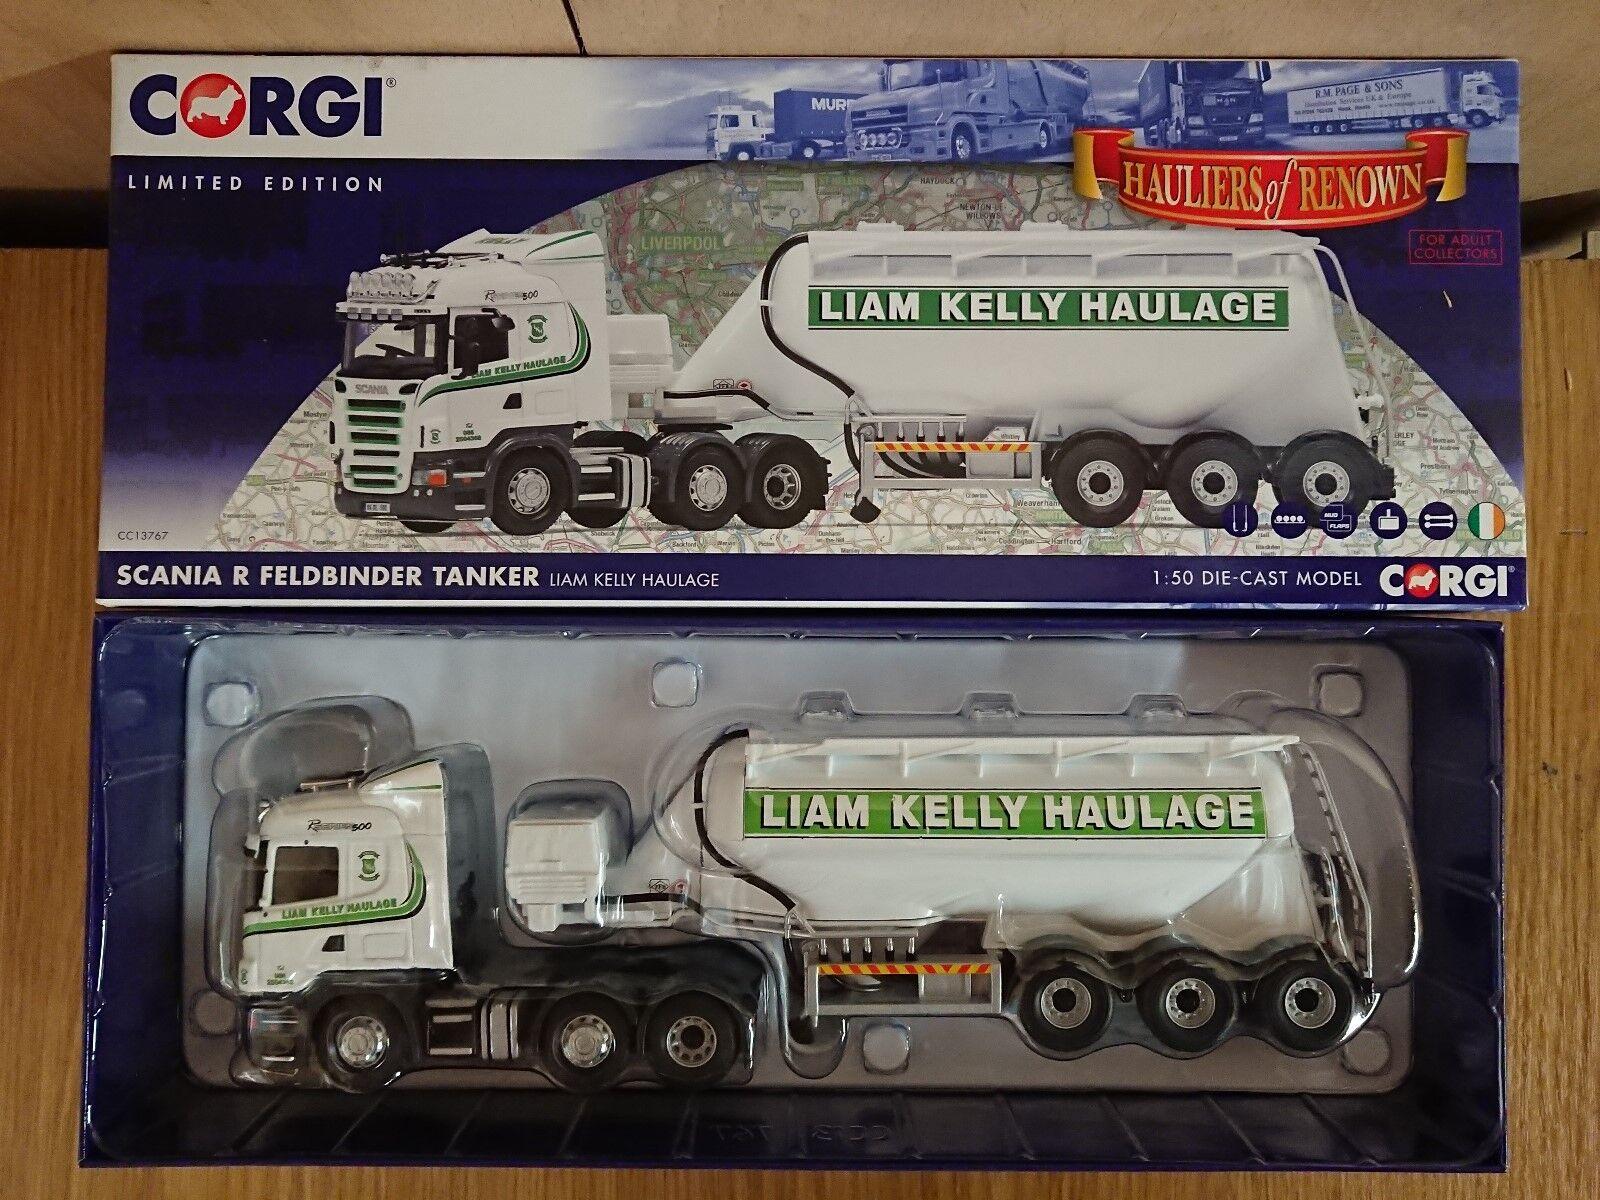 Corgi CC13767 Scania R Feldbinder Tanker Liam Kelly Haulage Ltd Ed. 618 of 800